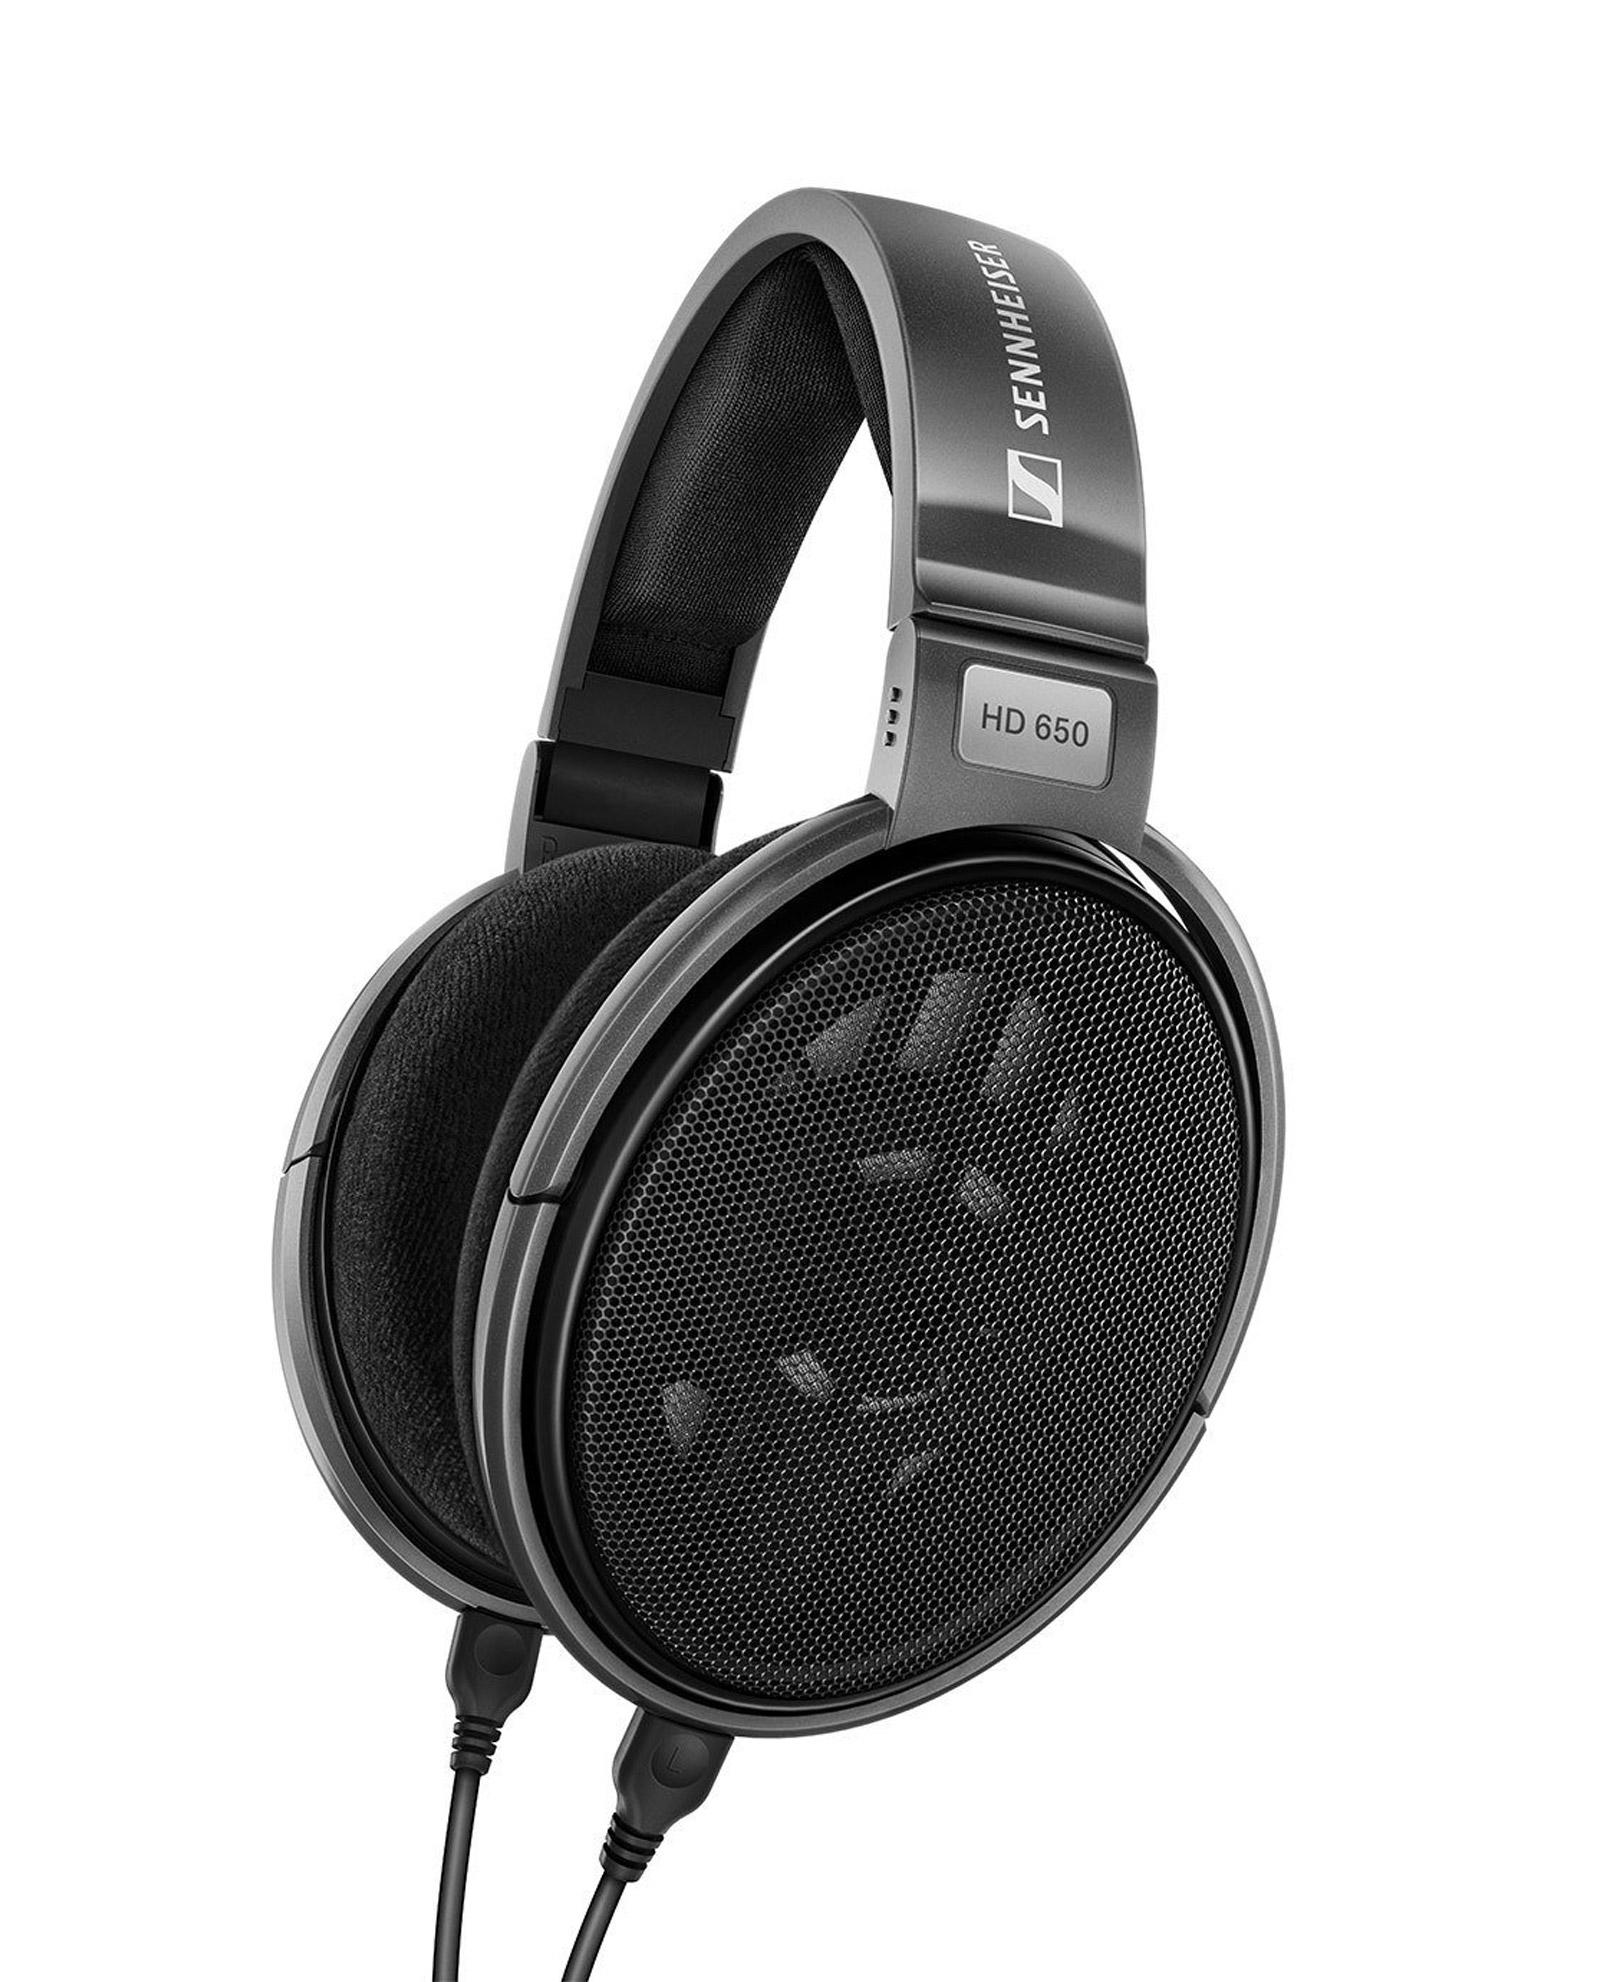 Sennheiser Hd 650 Over Ear Headphones